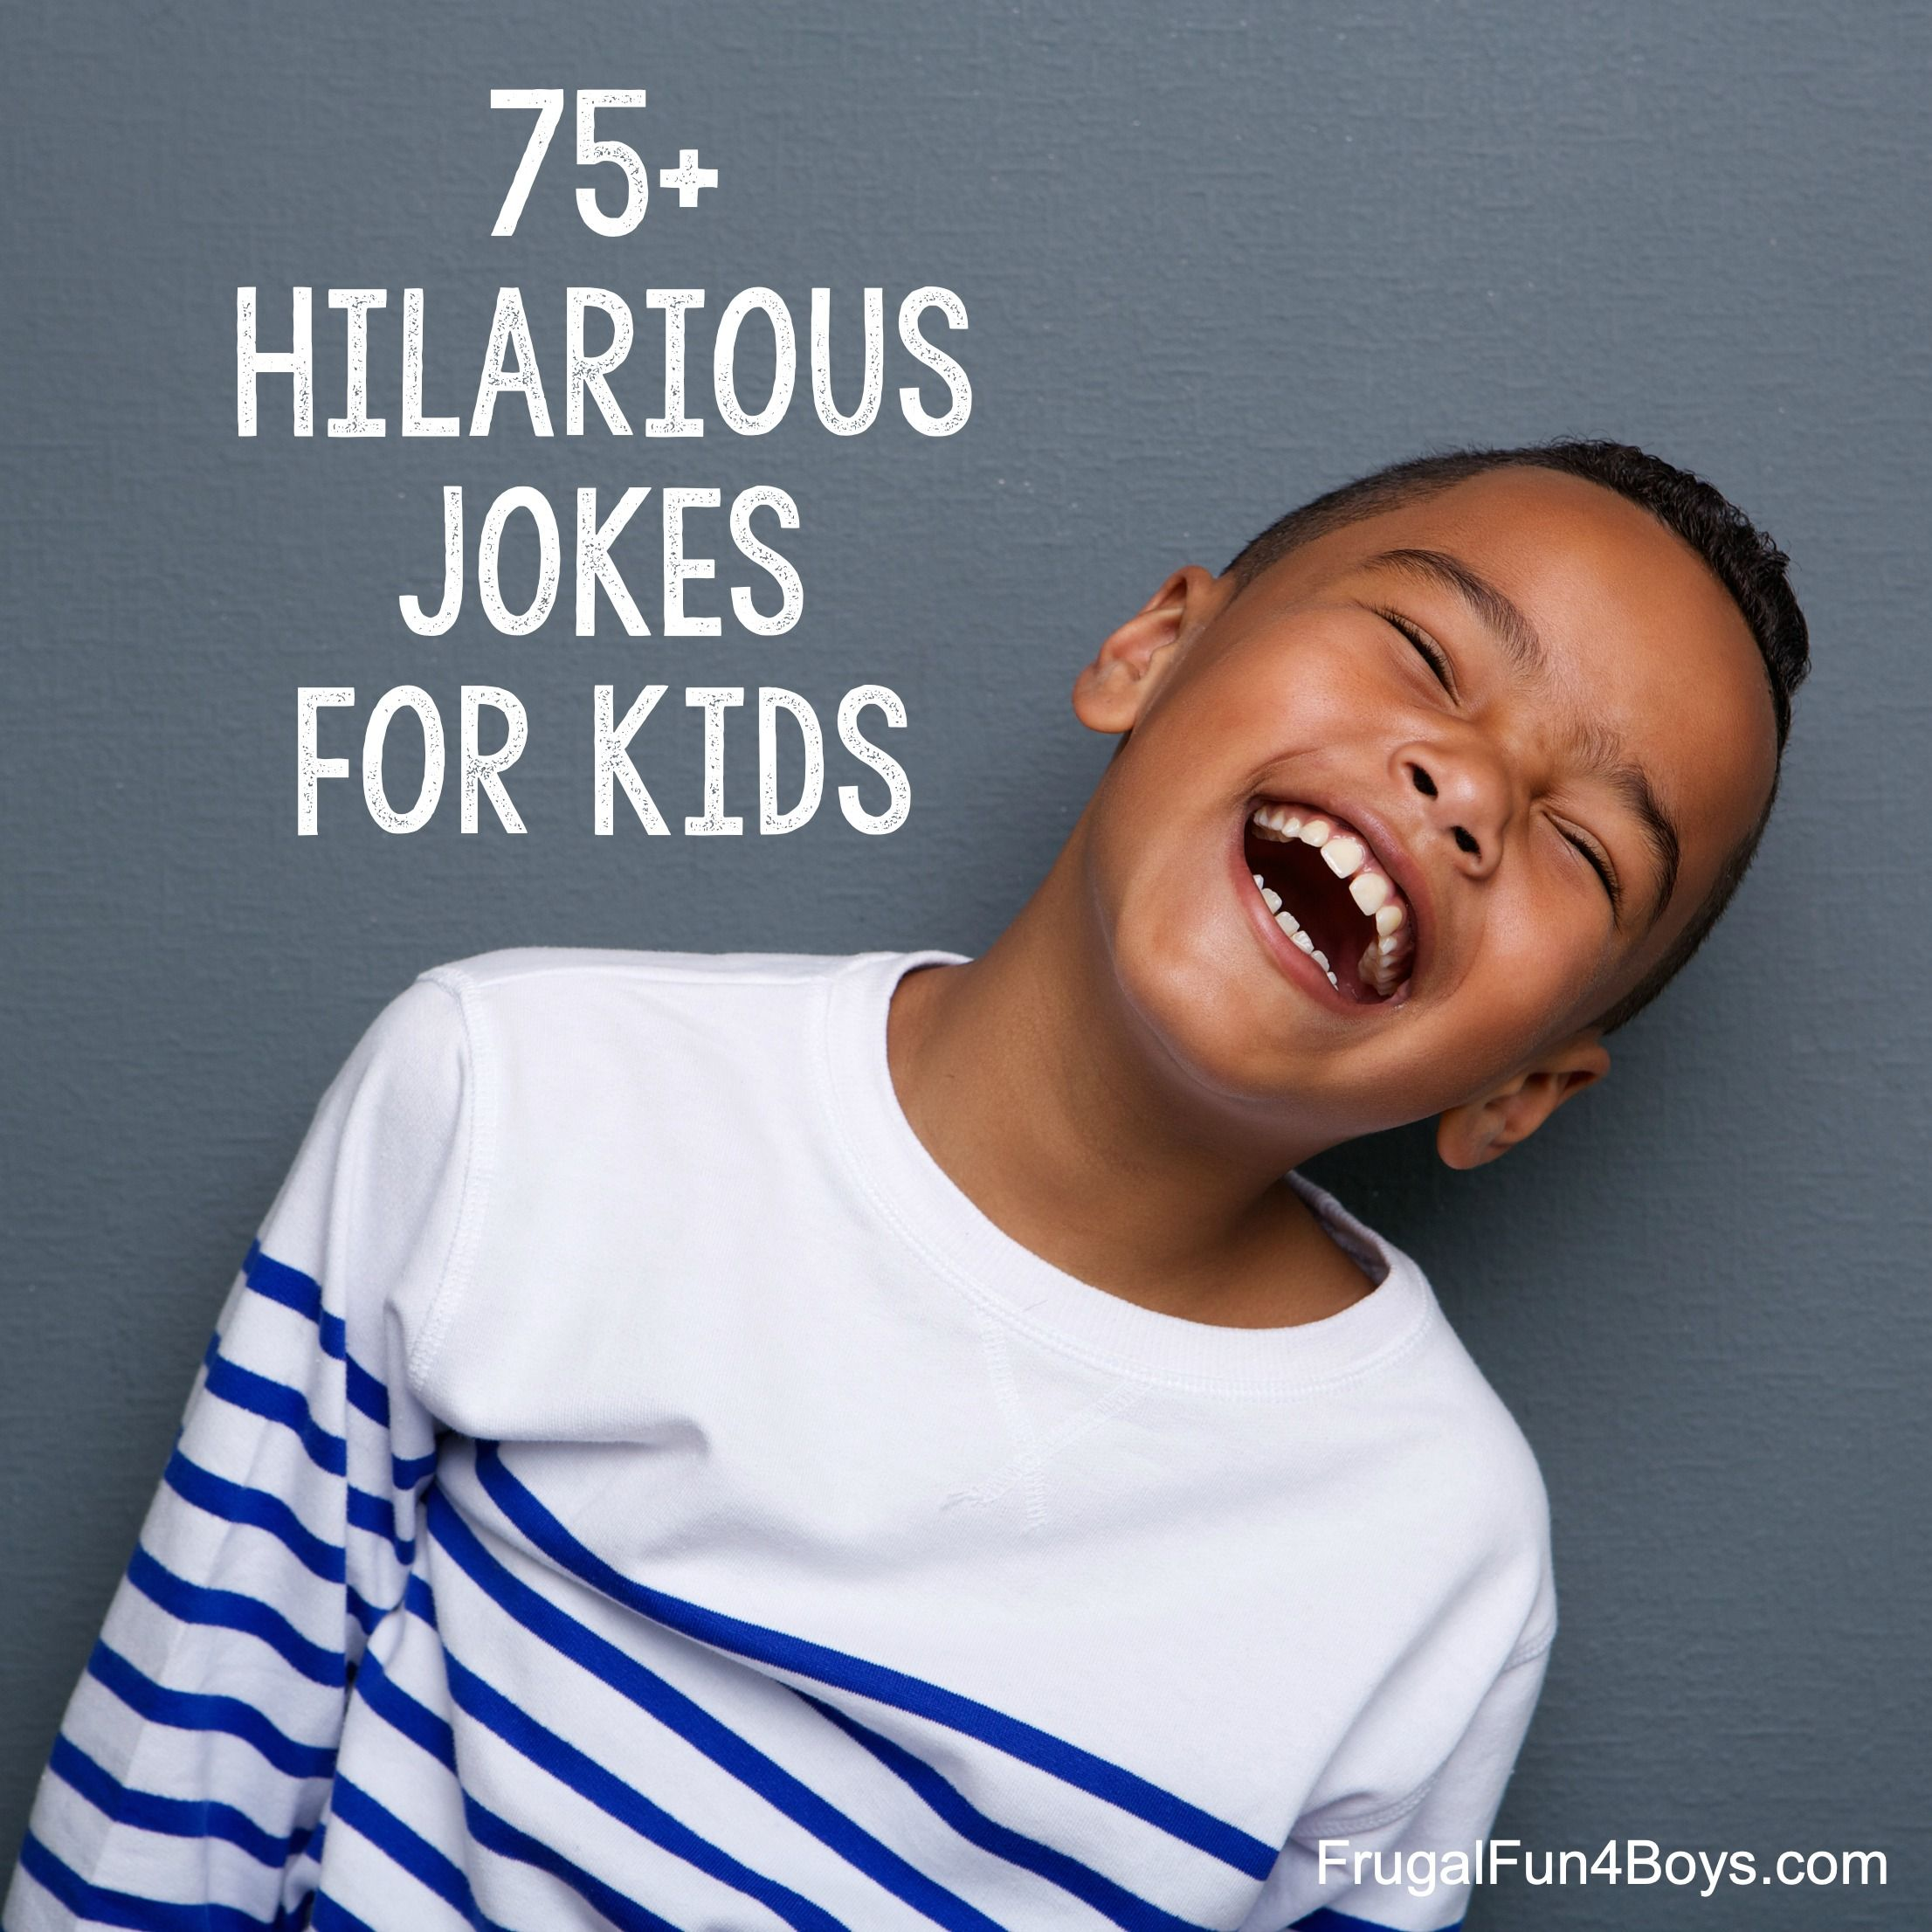 20 Hilarious Jokes To Tell Friends Jokes For Kids Funny Jokes For Kids Kids Parenting Funny